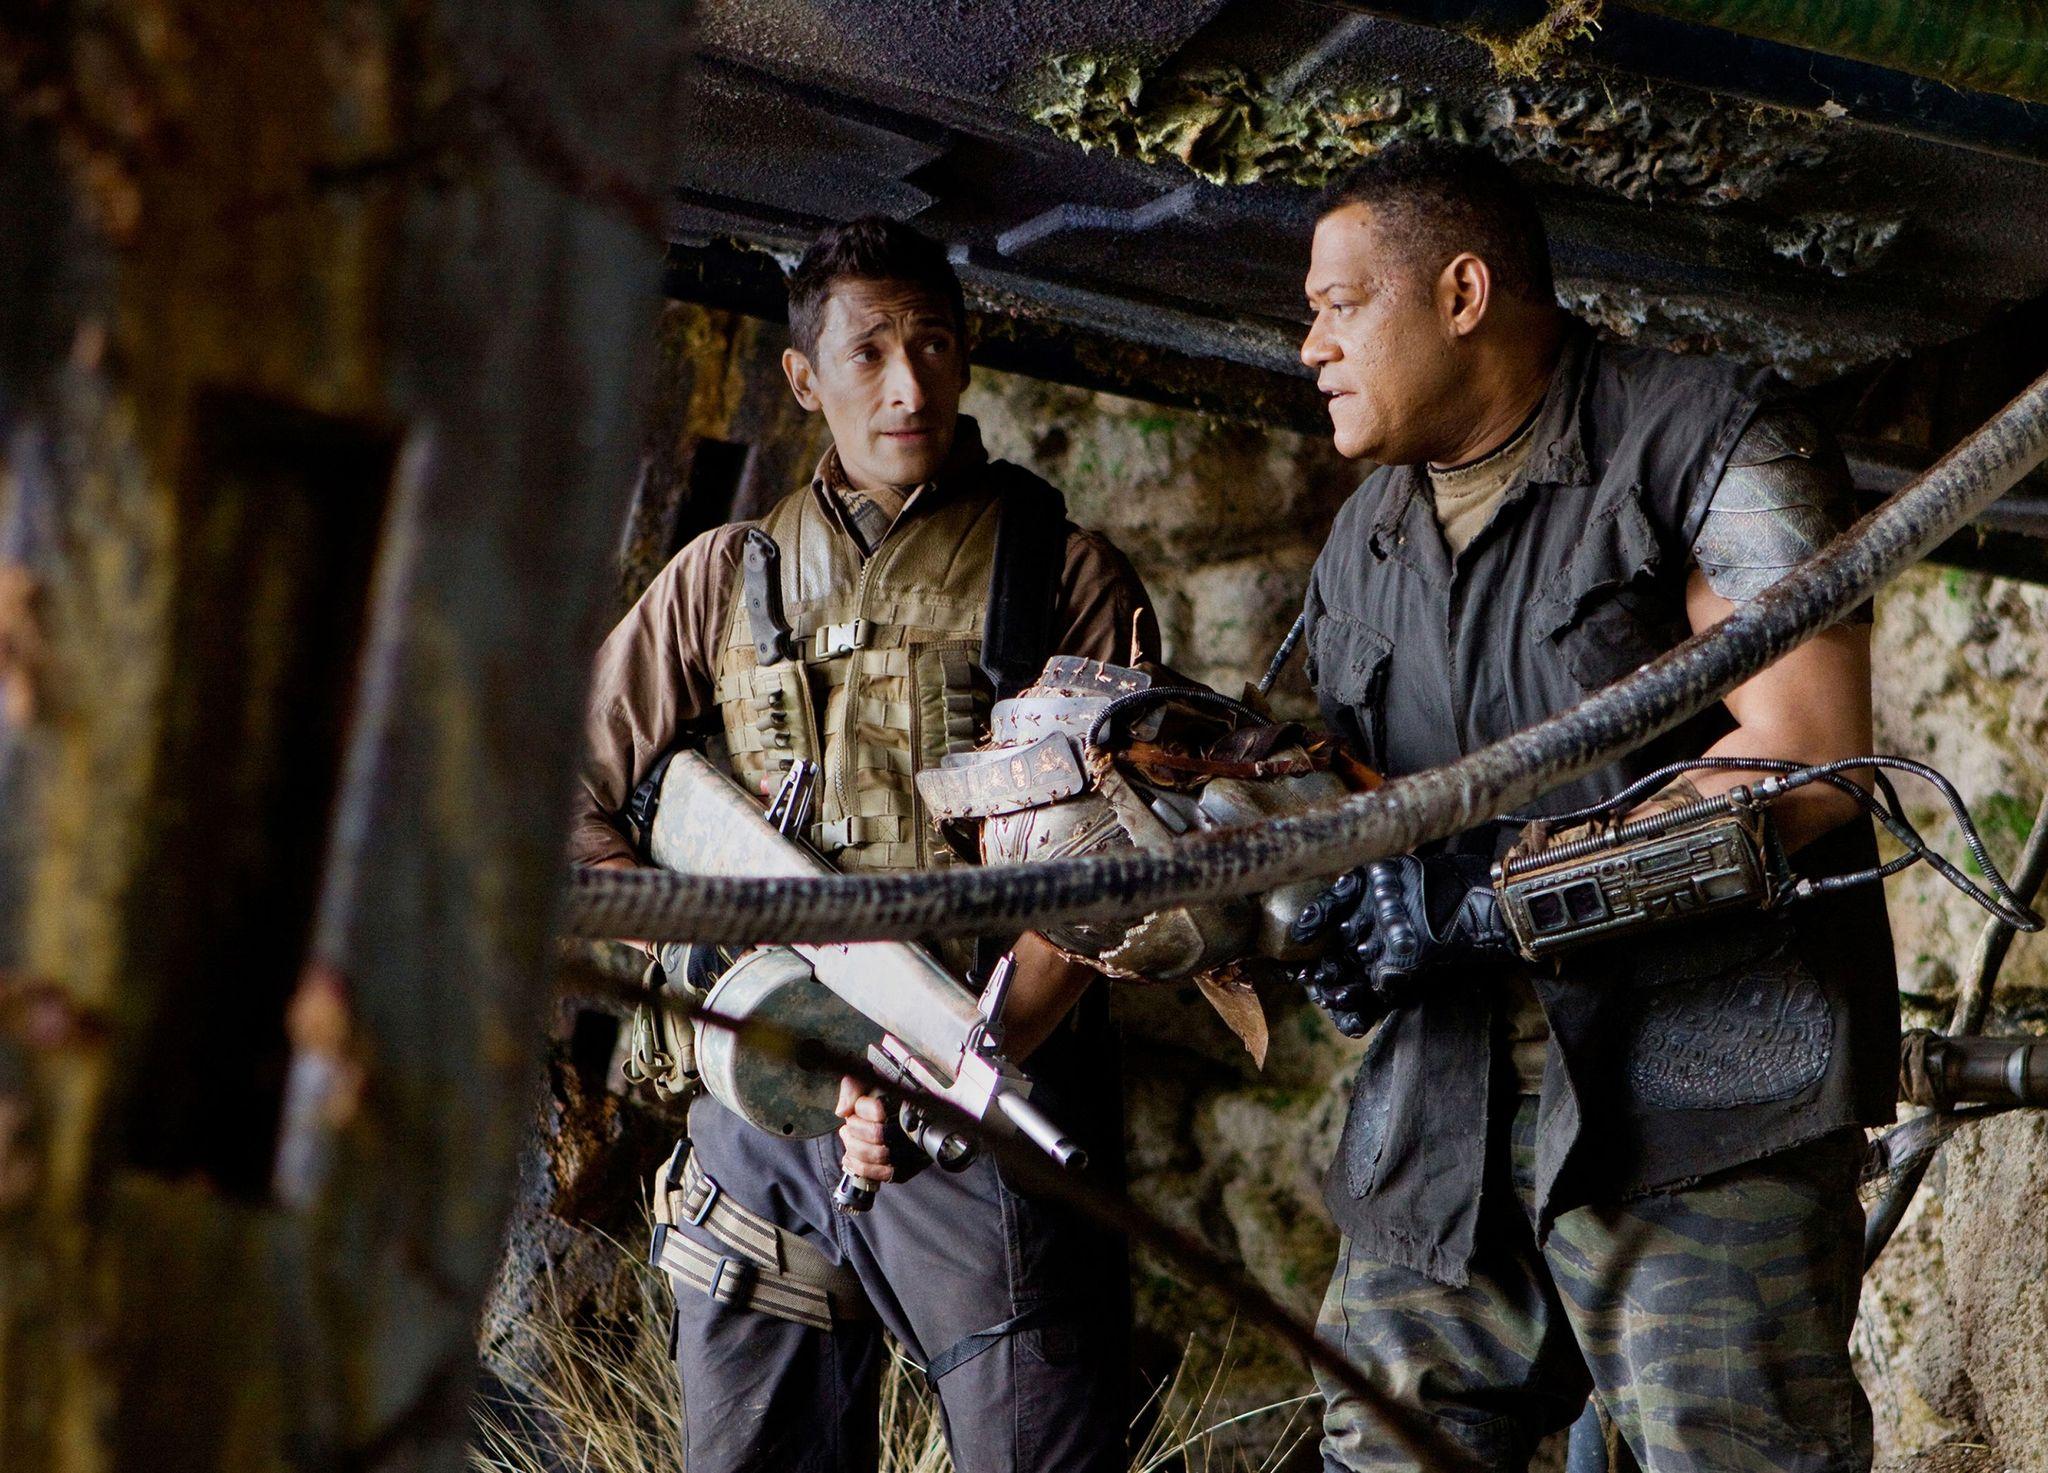 Laurence Fishburne and Adrien Brody in Predators (2010)